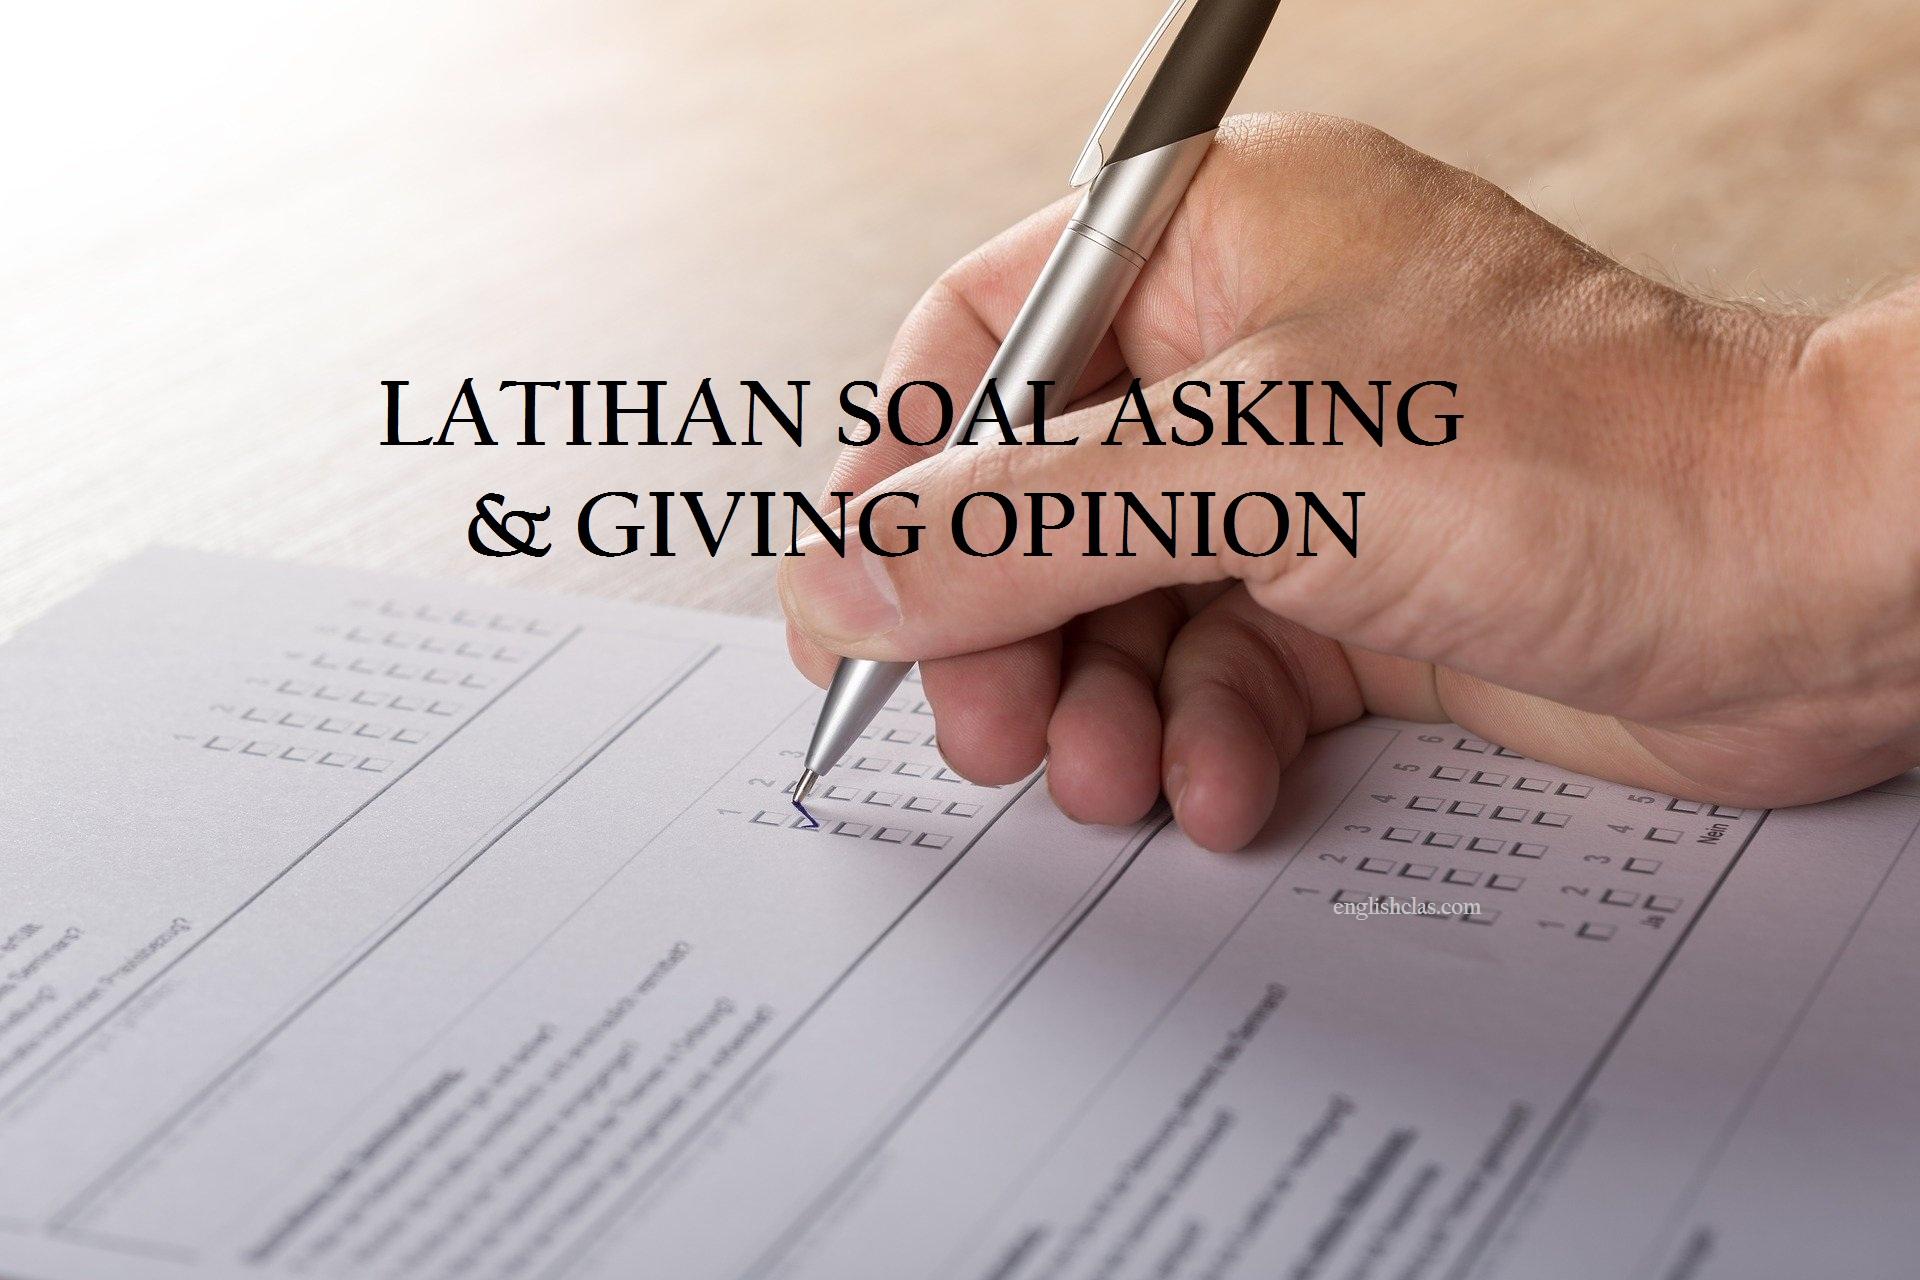 Contoh Soal Asking Giving Opinion Pilihan Ganda